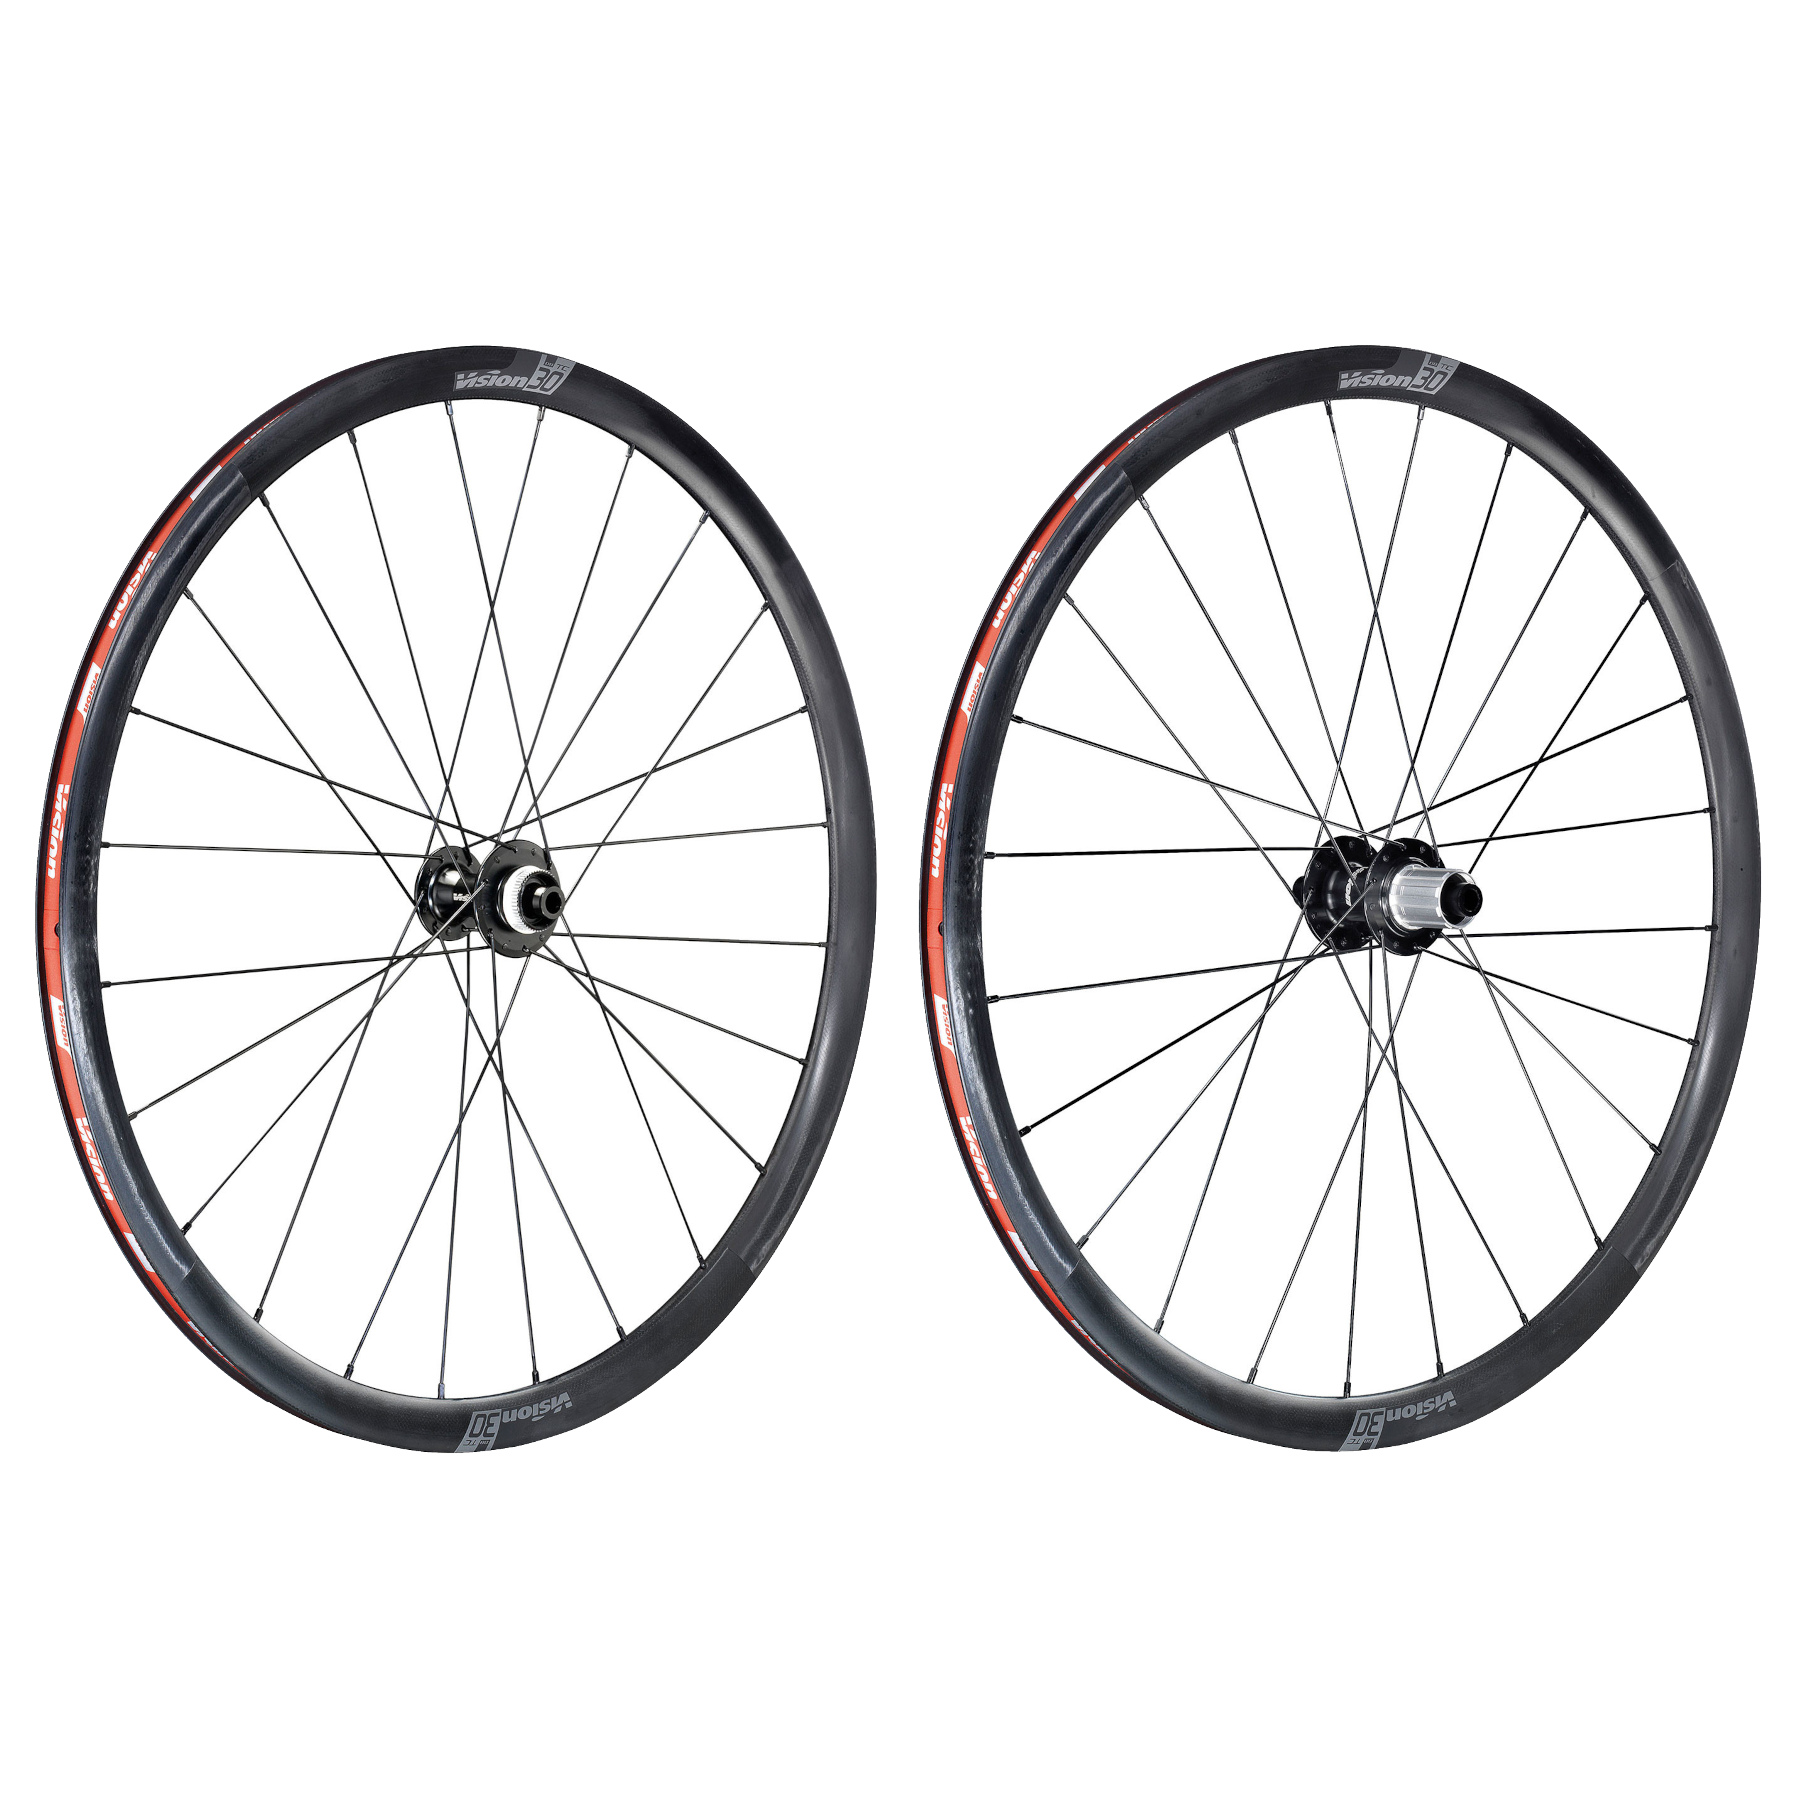 Vision TC 30 Disc Carbon Laufradsatz - TLR - Centerlock - 12x100mm | 12x142mm - Shimano HG